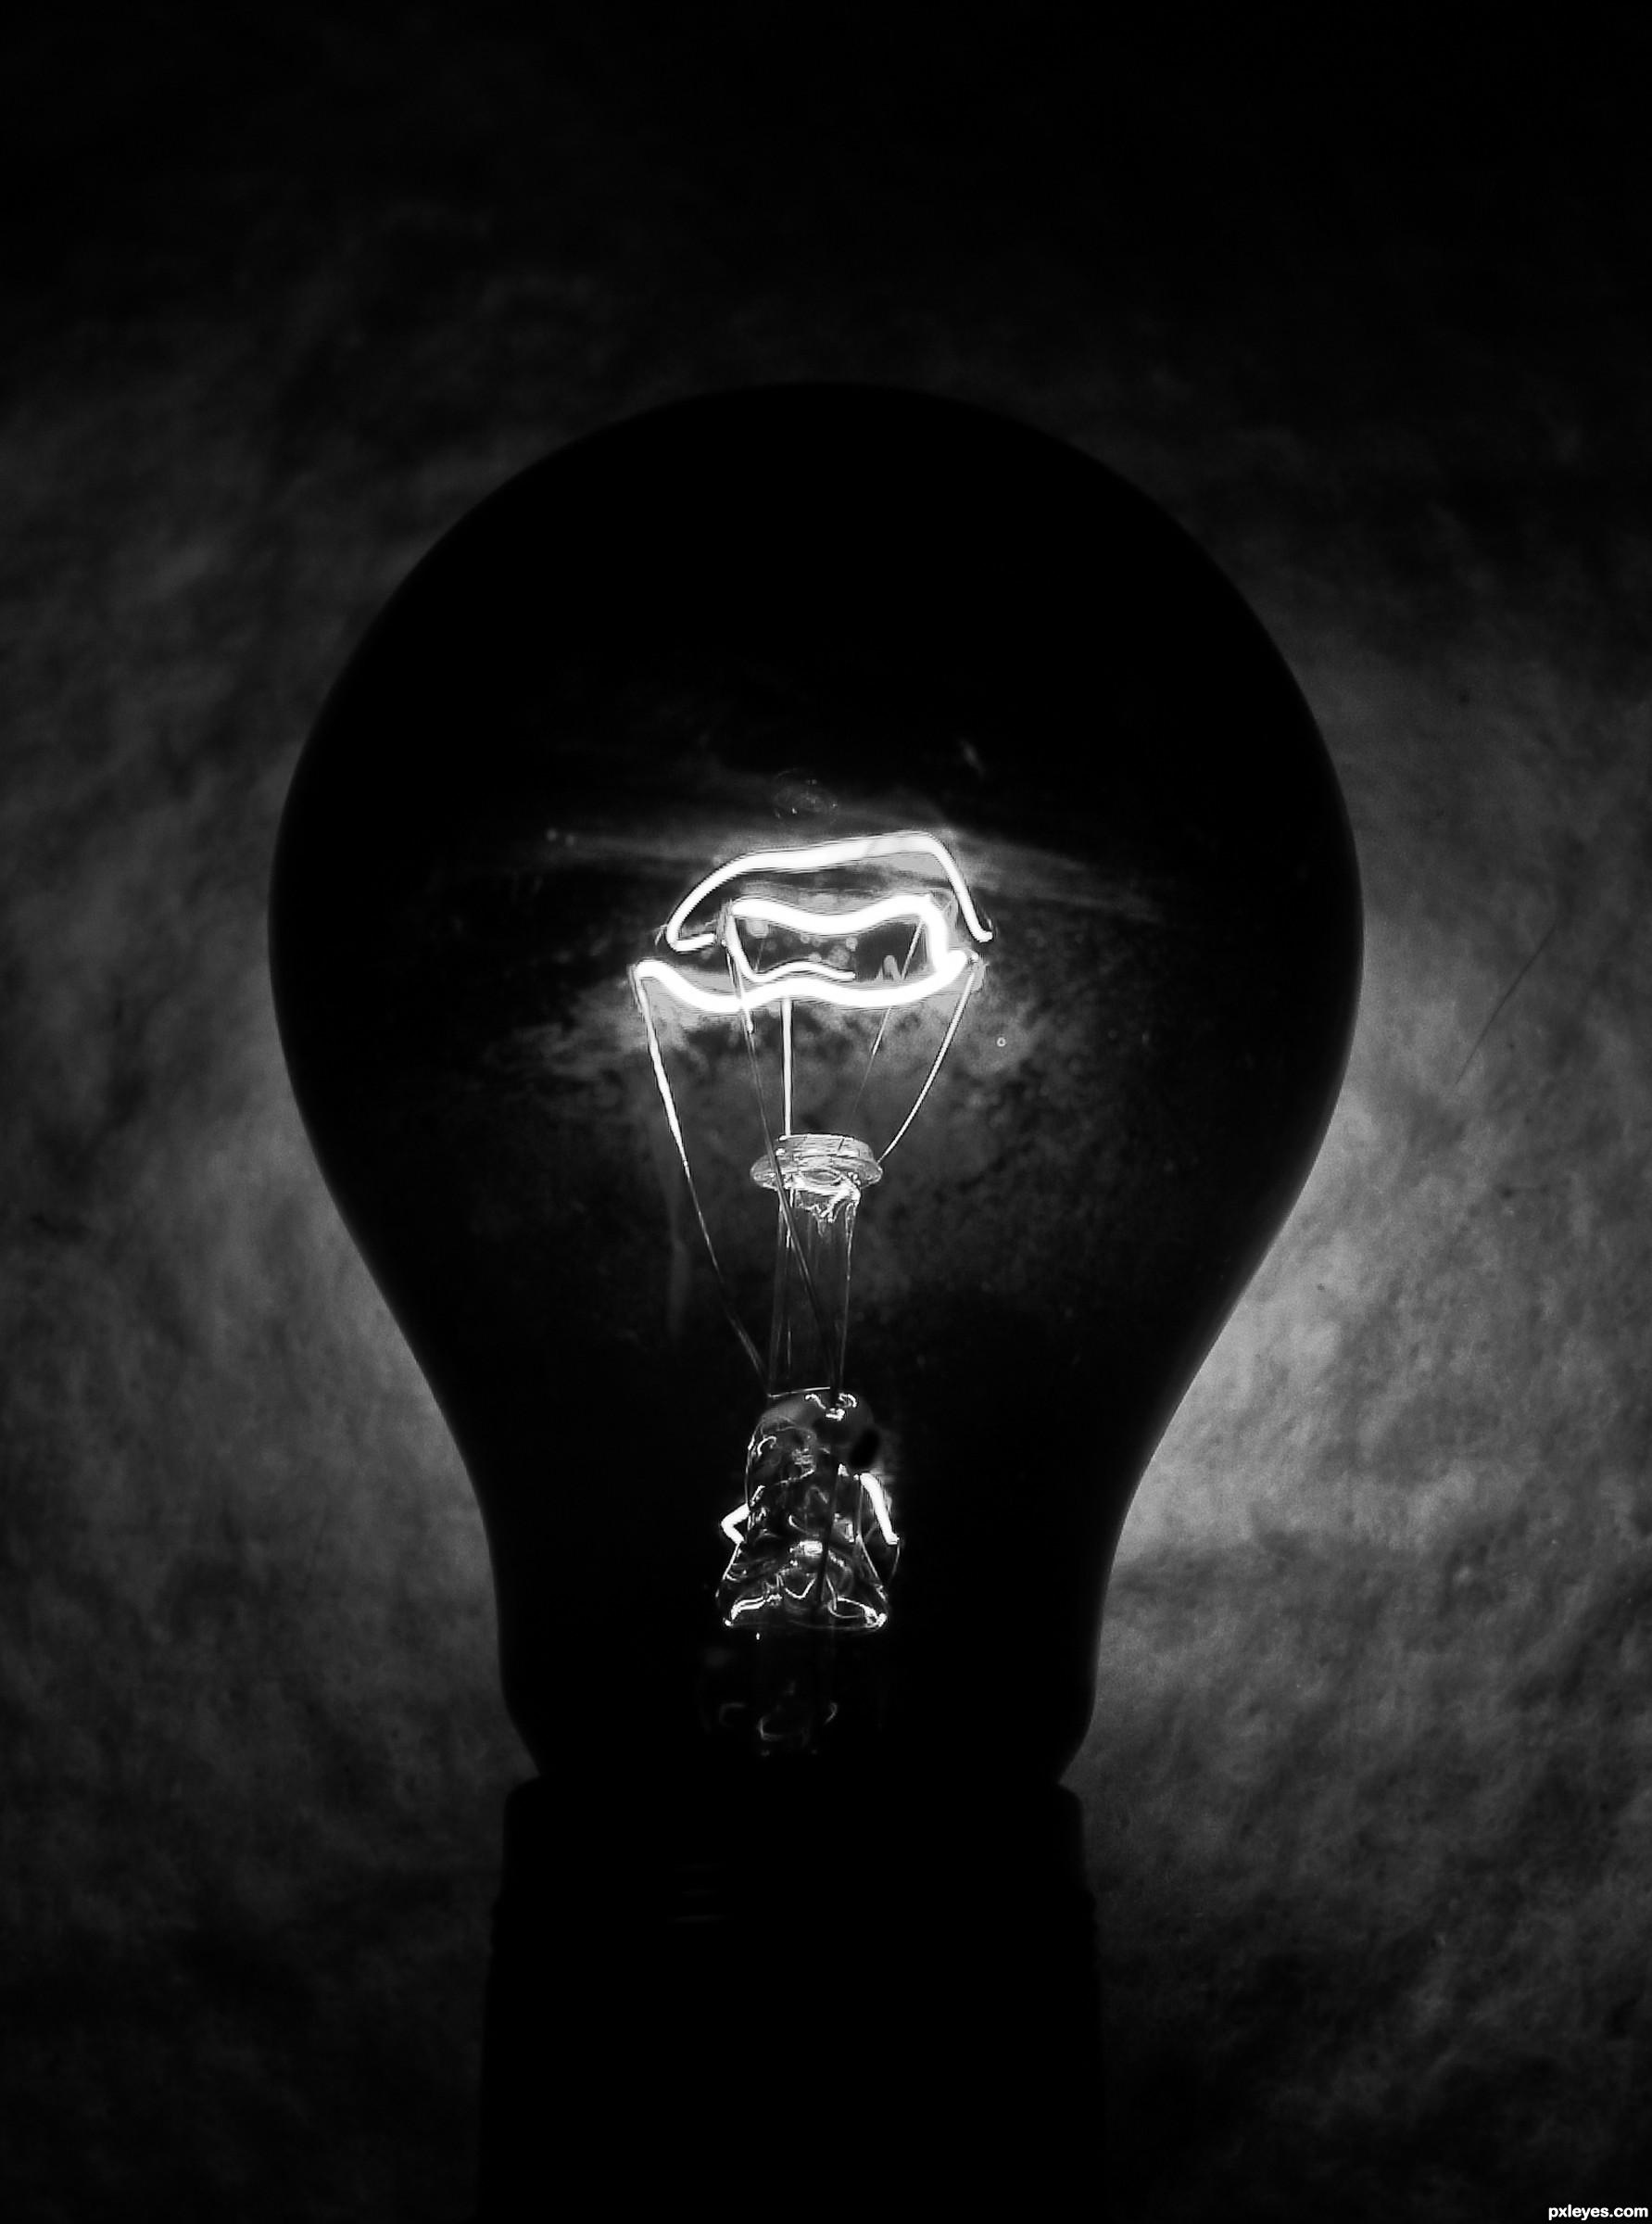 Dark room with light bulb - Dark Matter Created By Kyricom